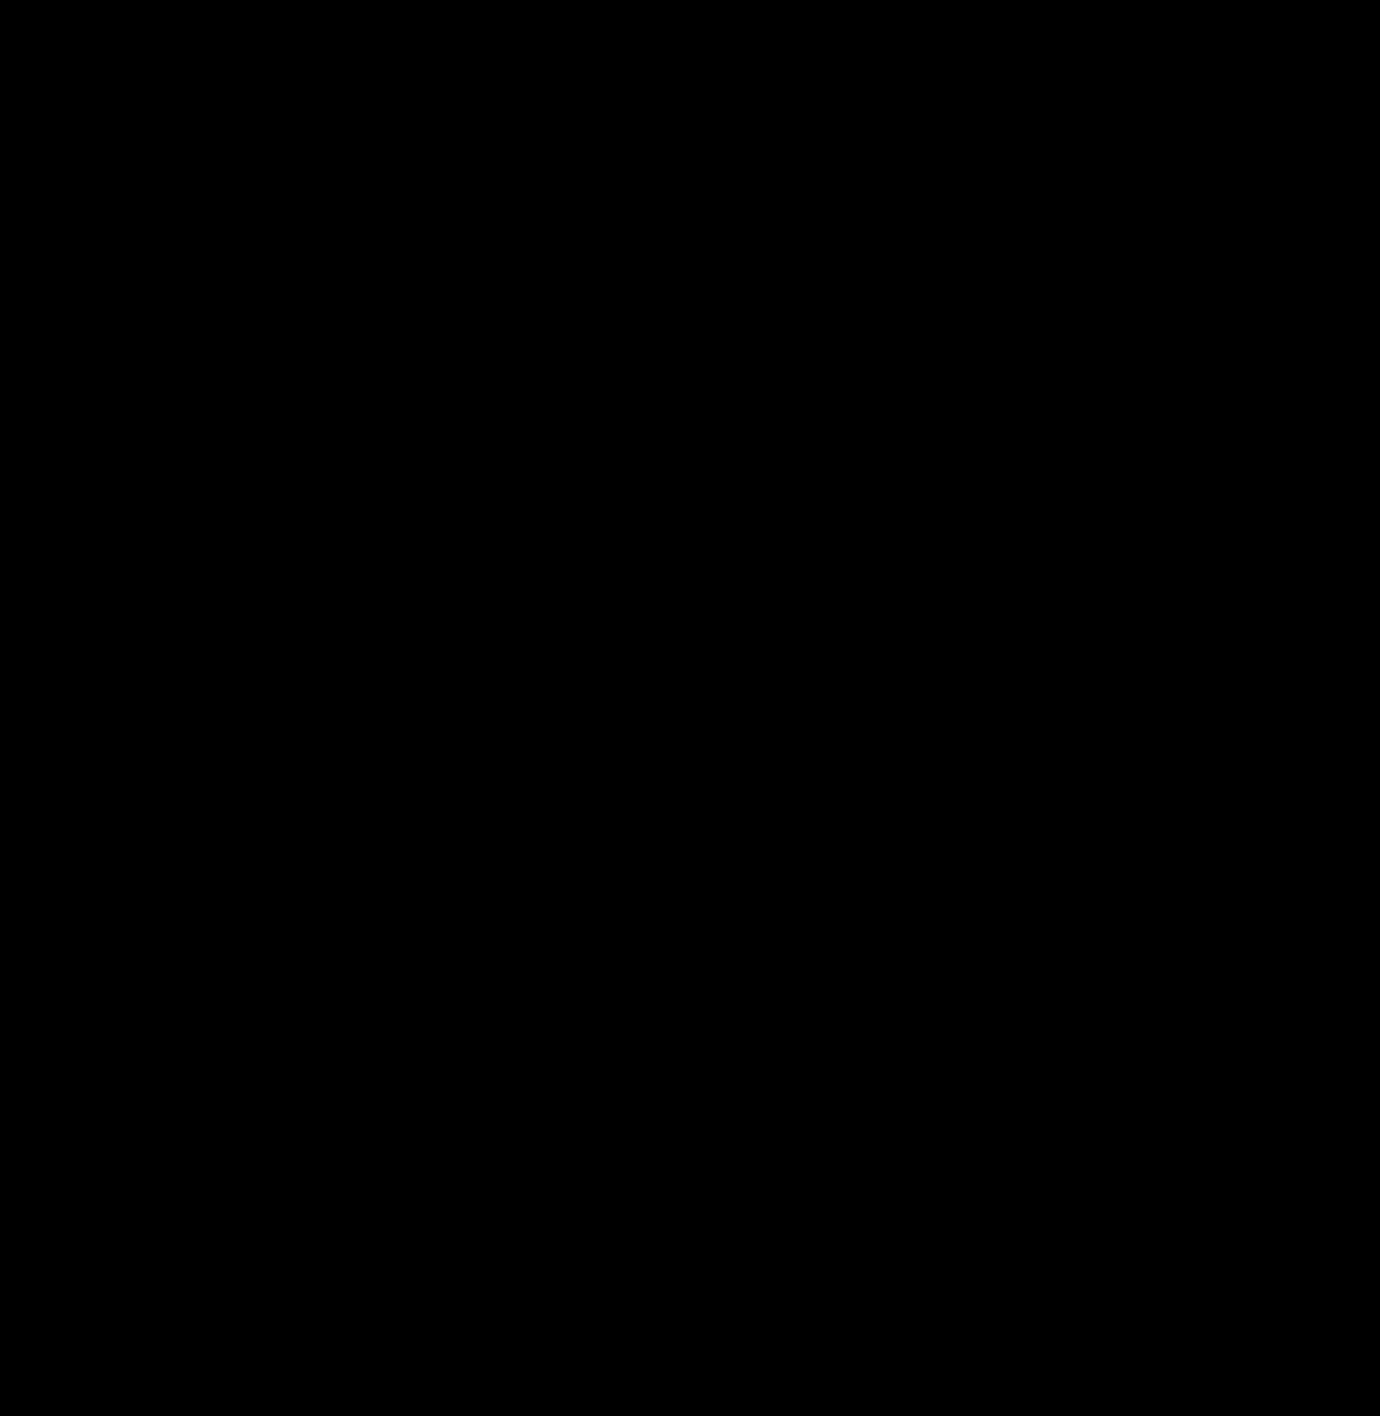 SE 123